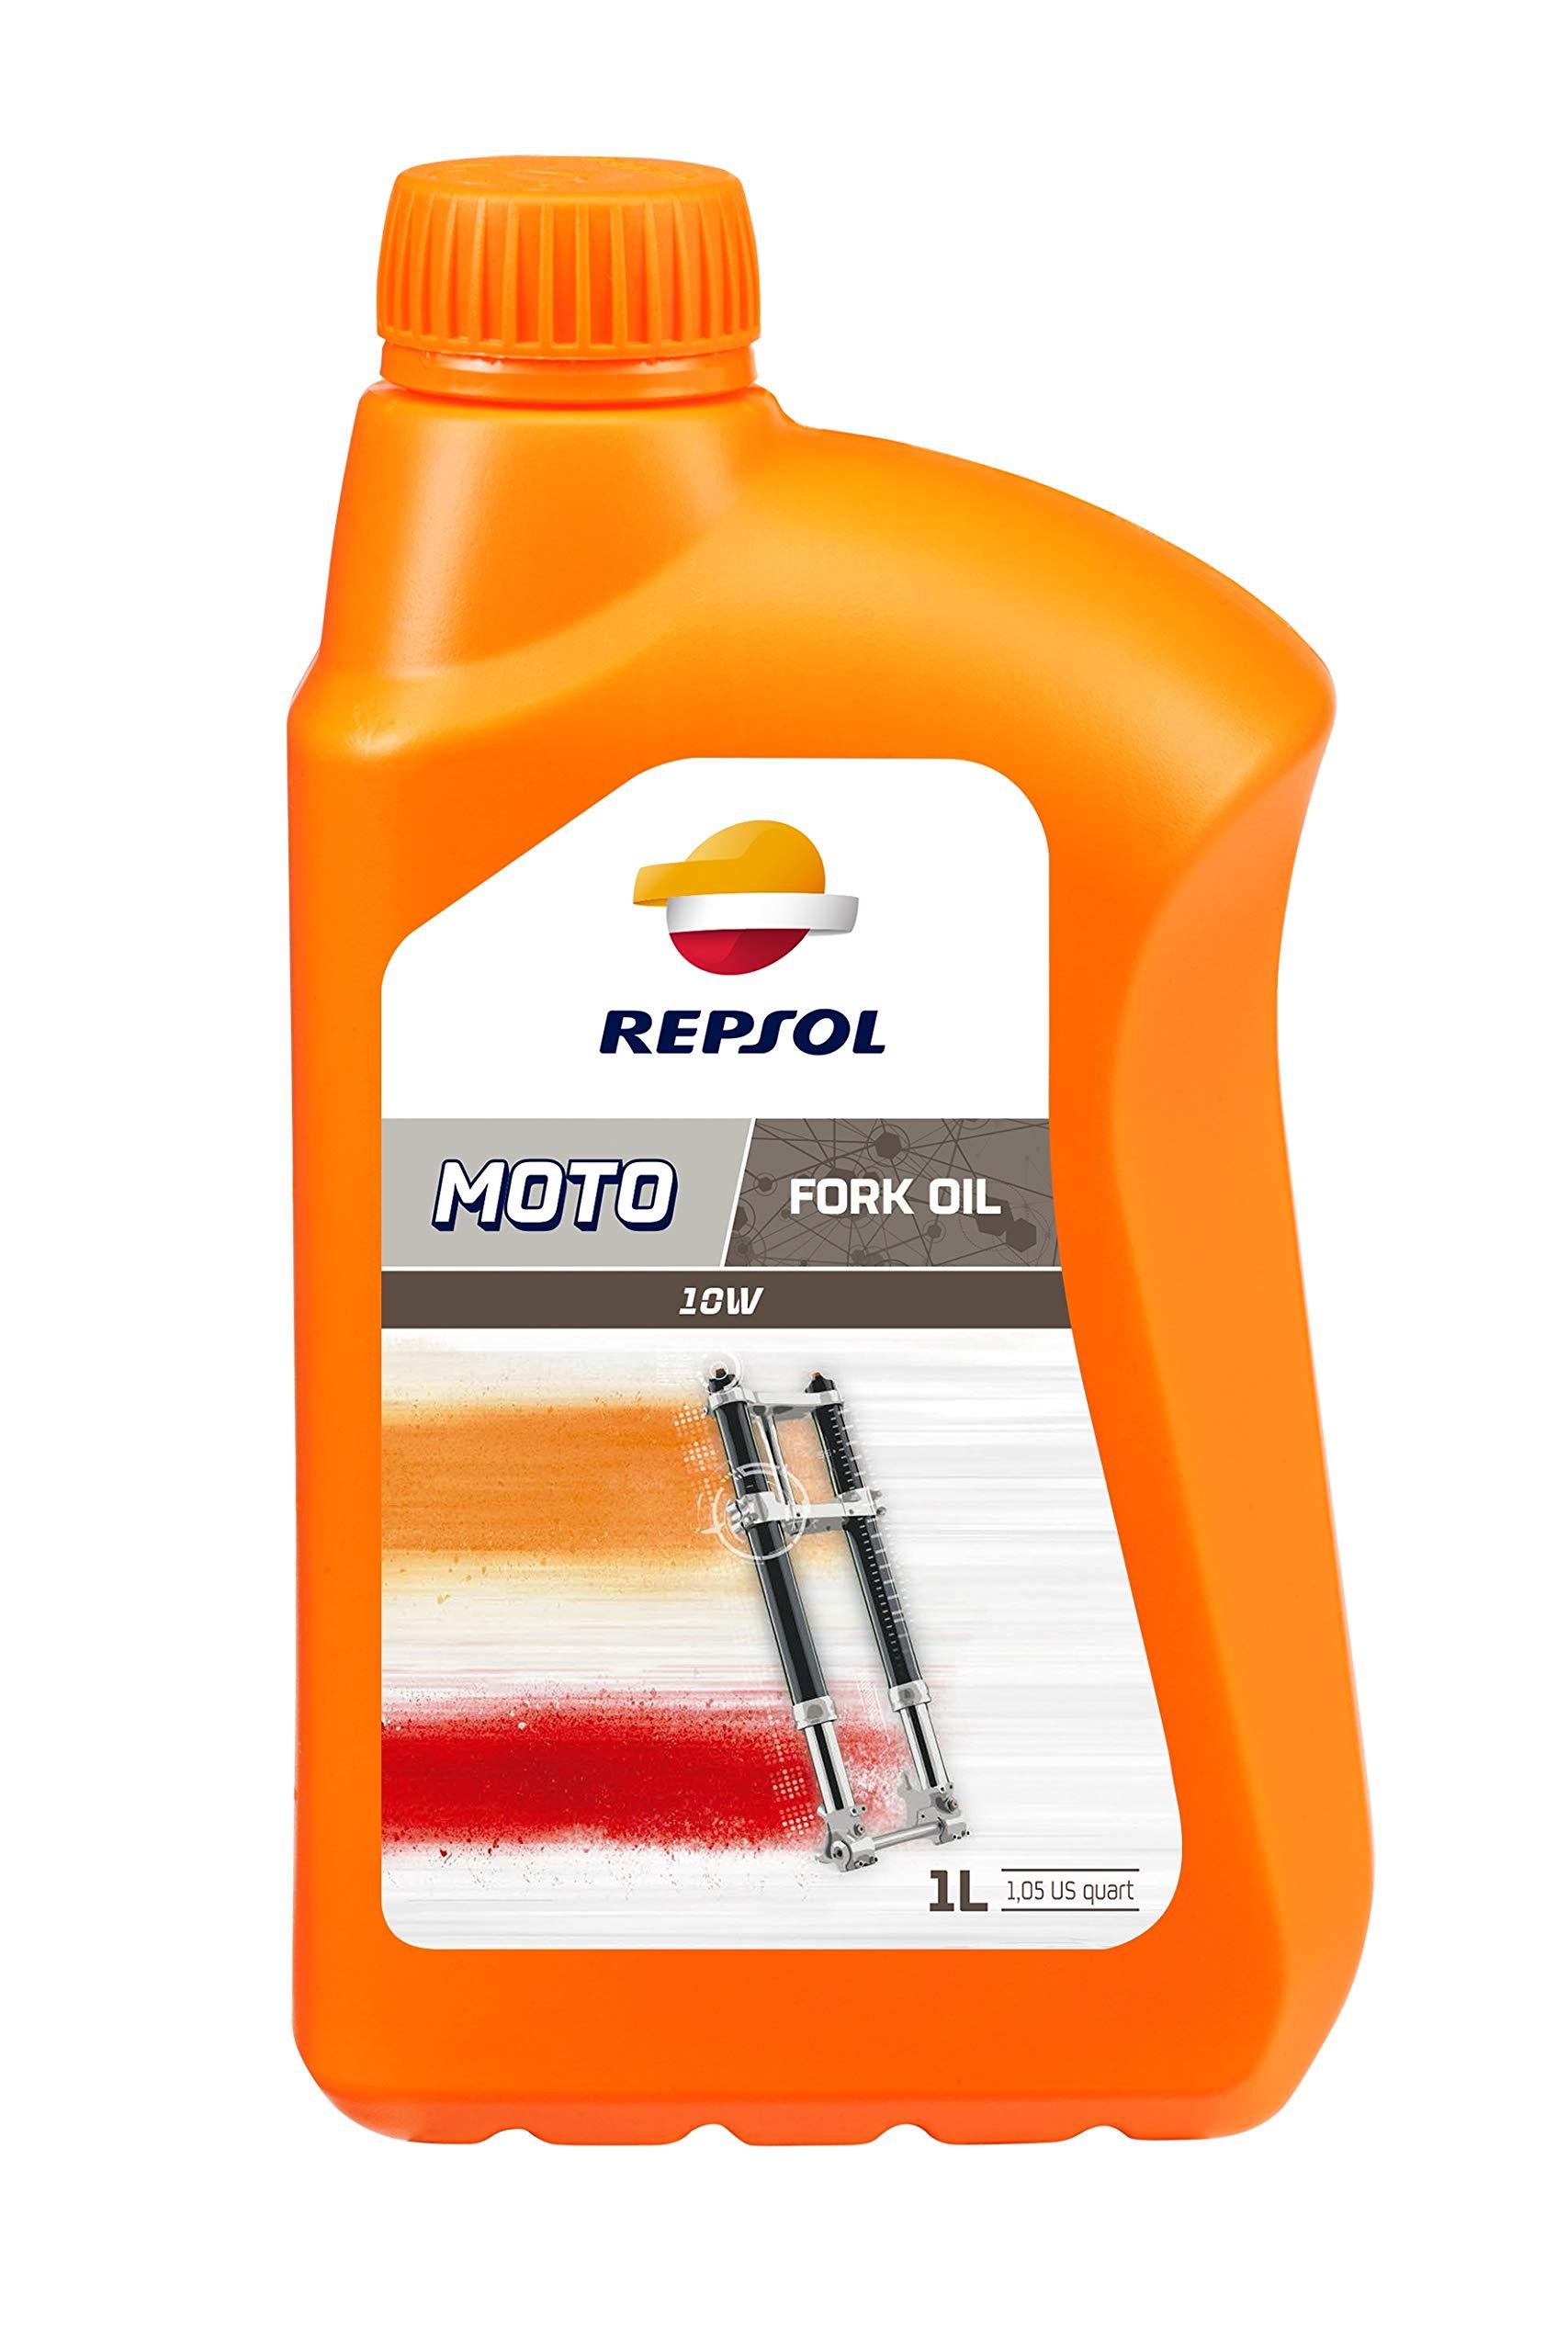 Repsol RP172X51 Moto Fork Oil 10W Aceite de Motor, 1 L: Amazon.es: Coche y moto